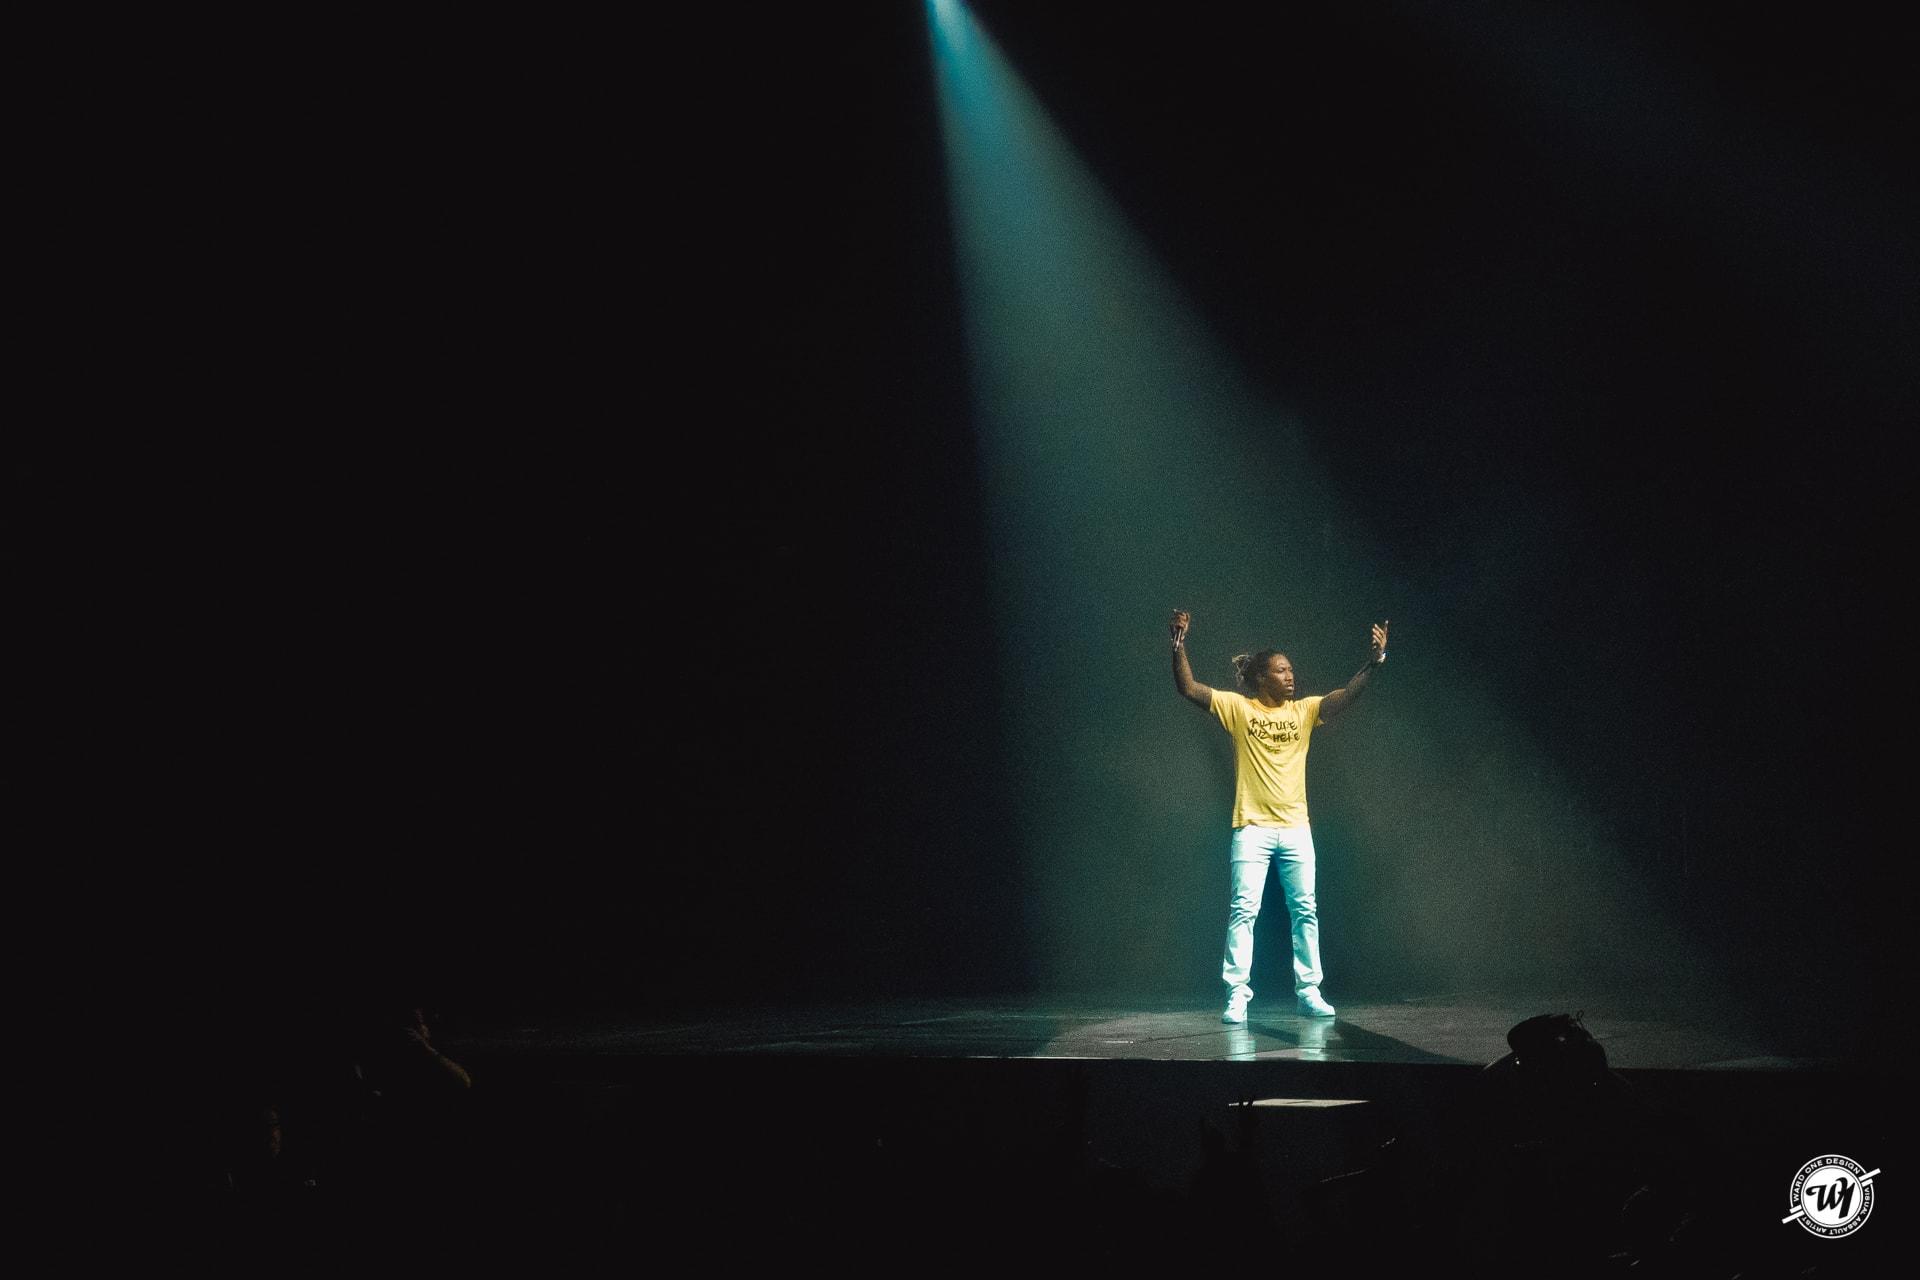 Drake and Future - Summer Sixteen Tour